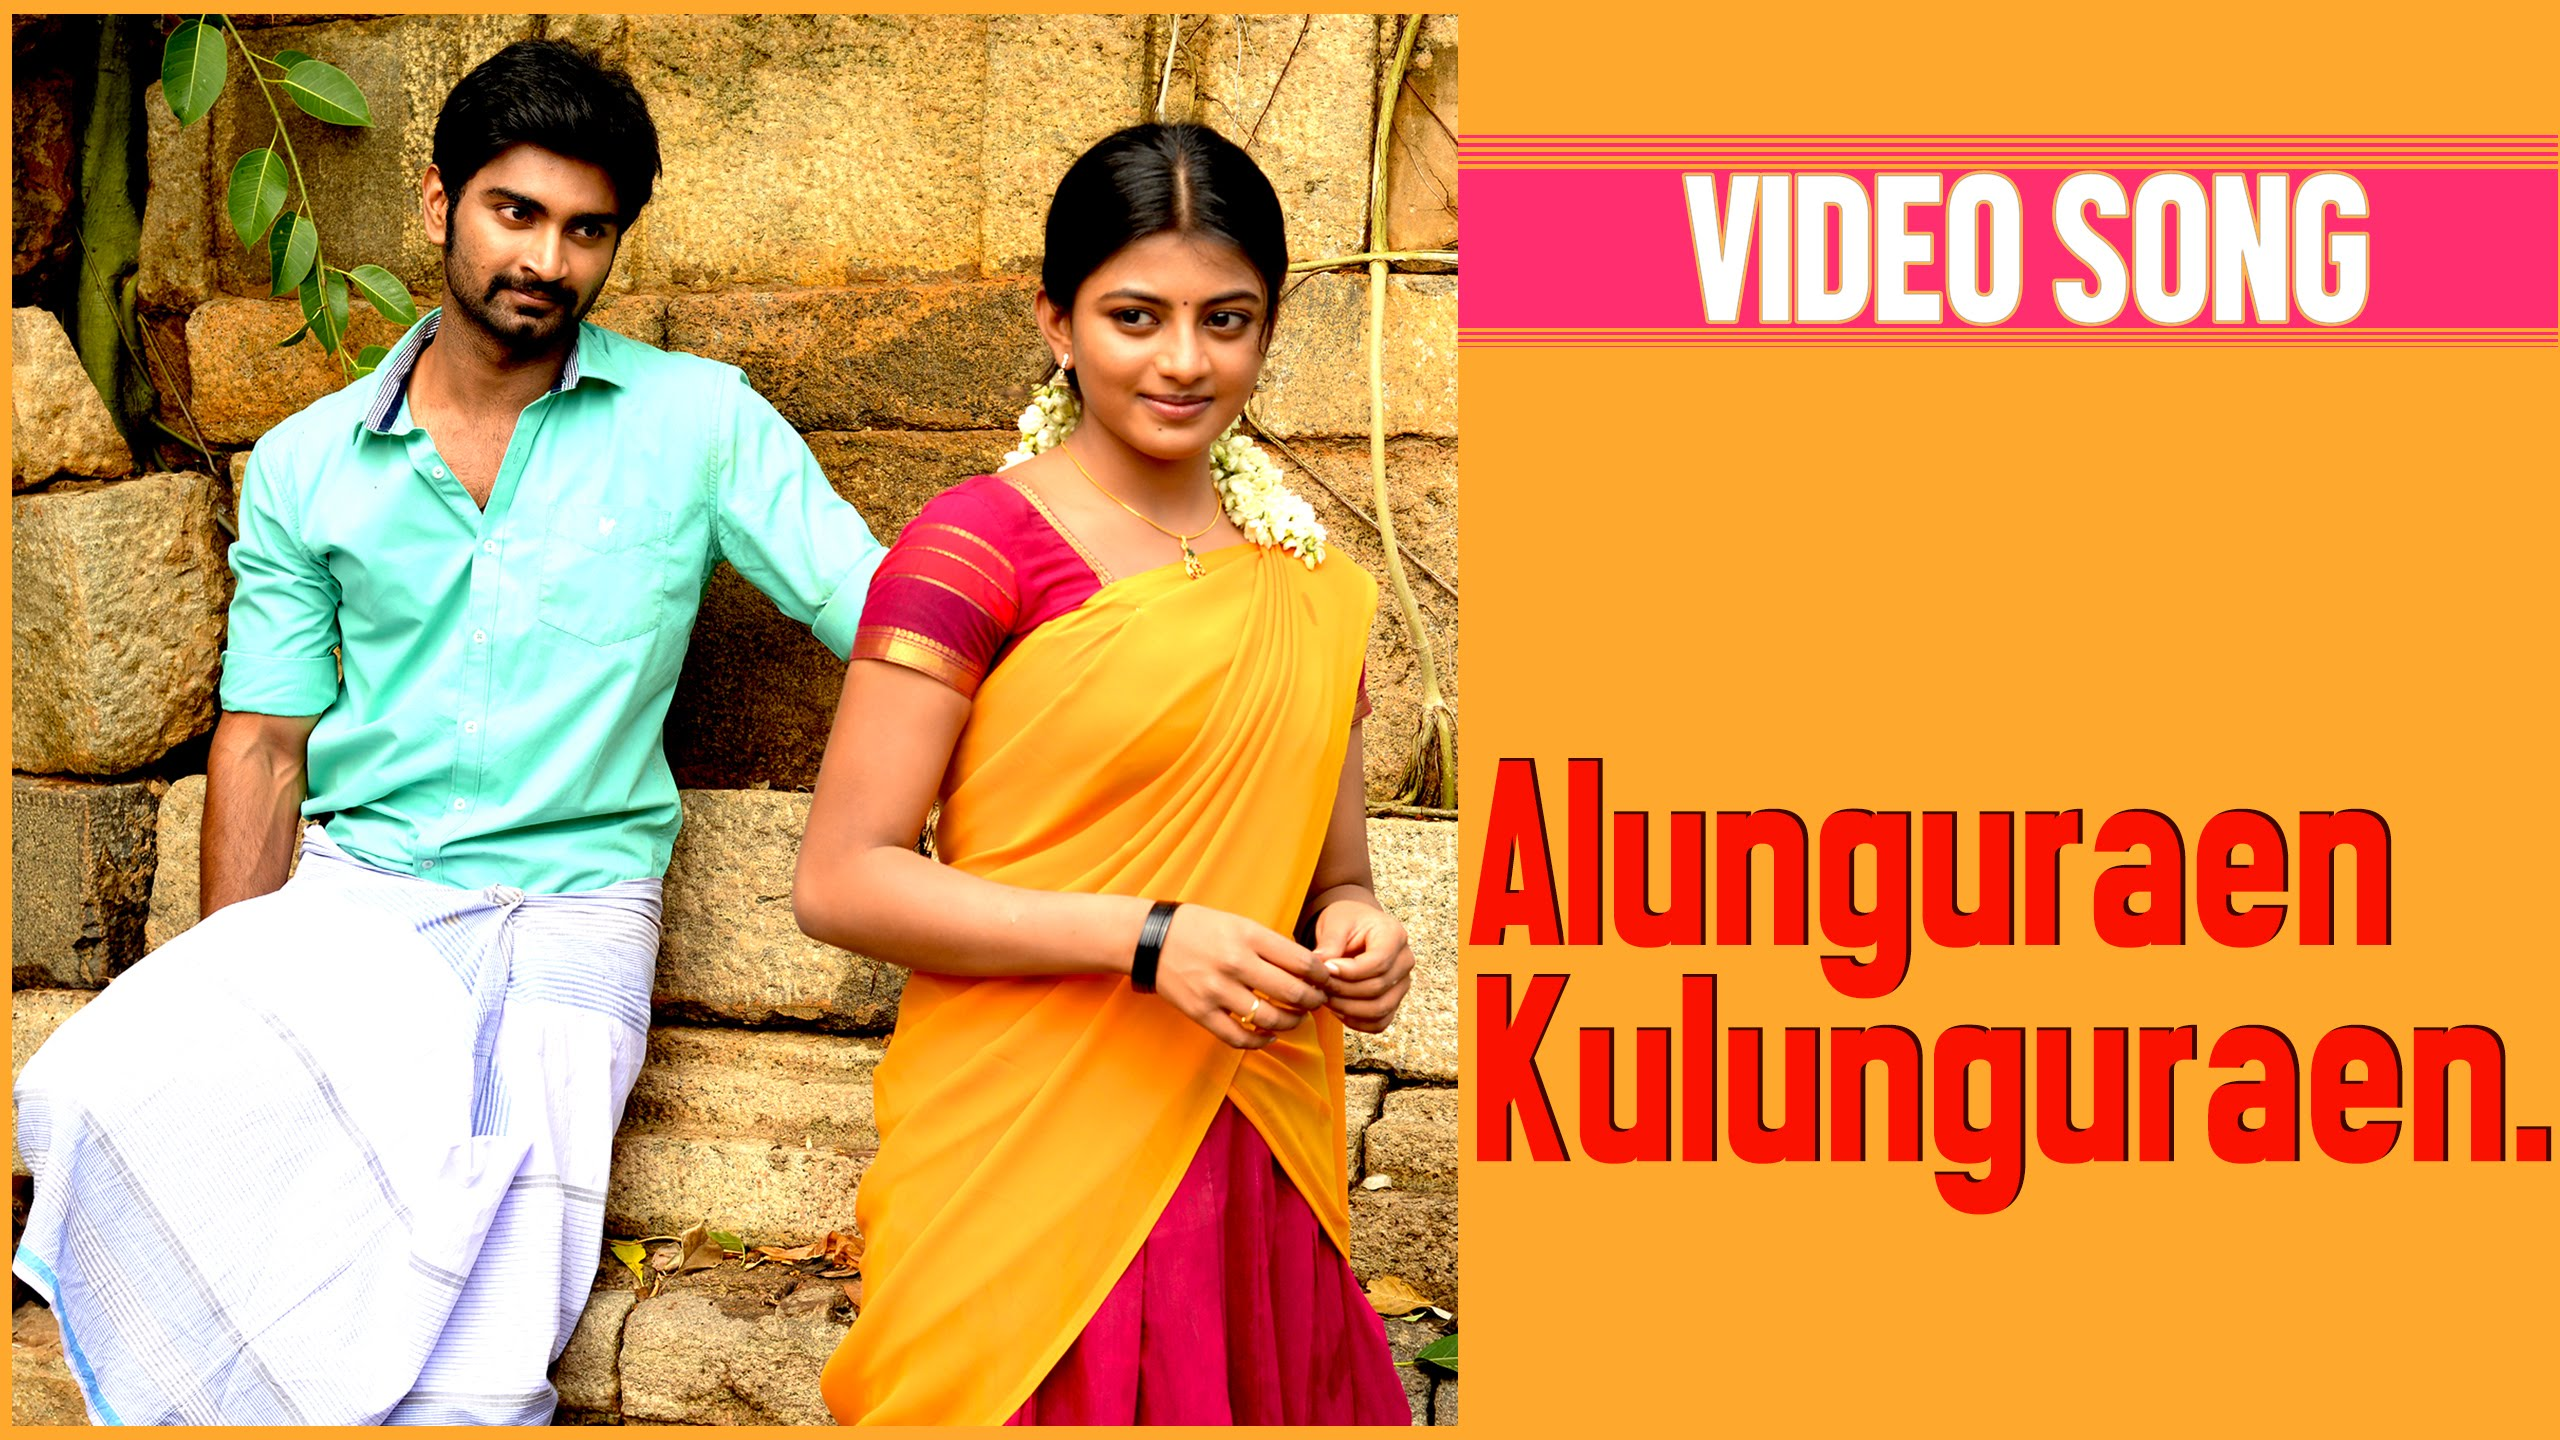 Chandi Veeran | Alunguraen Kulunguraen | Video Song | TrendMusic